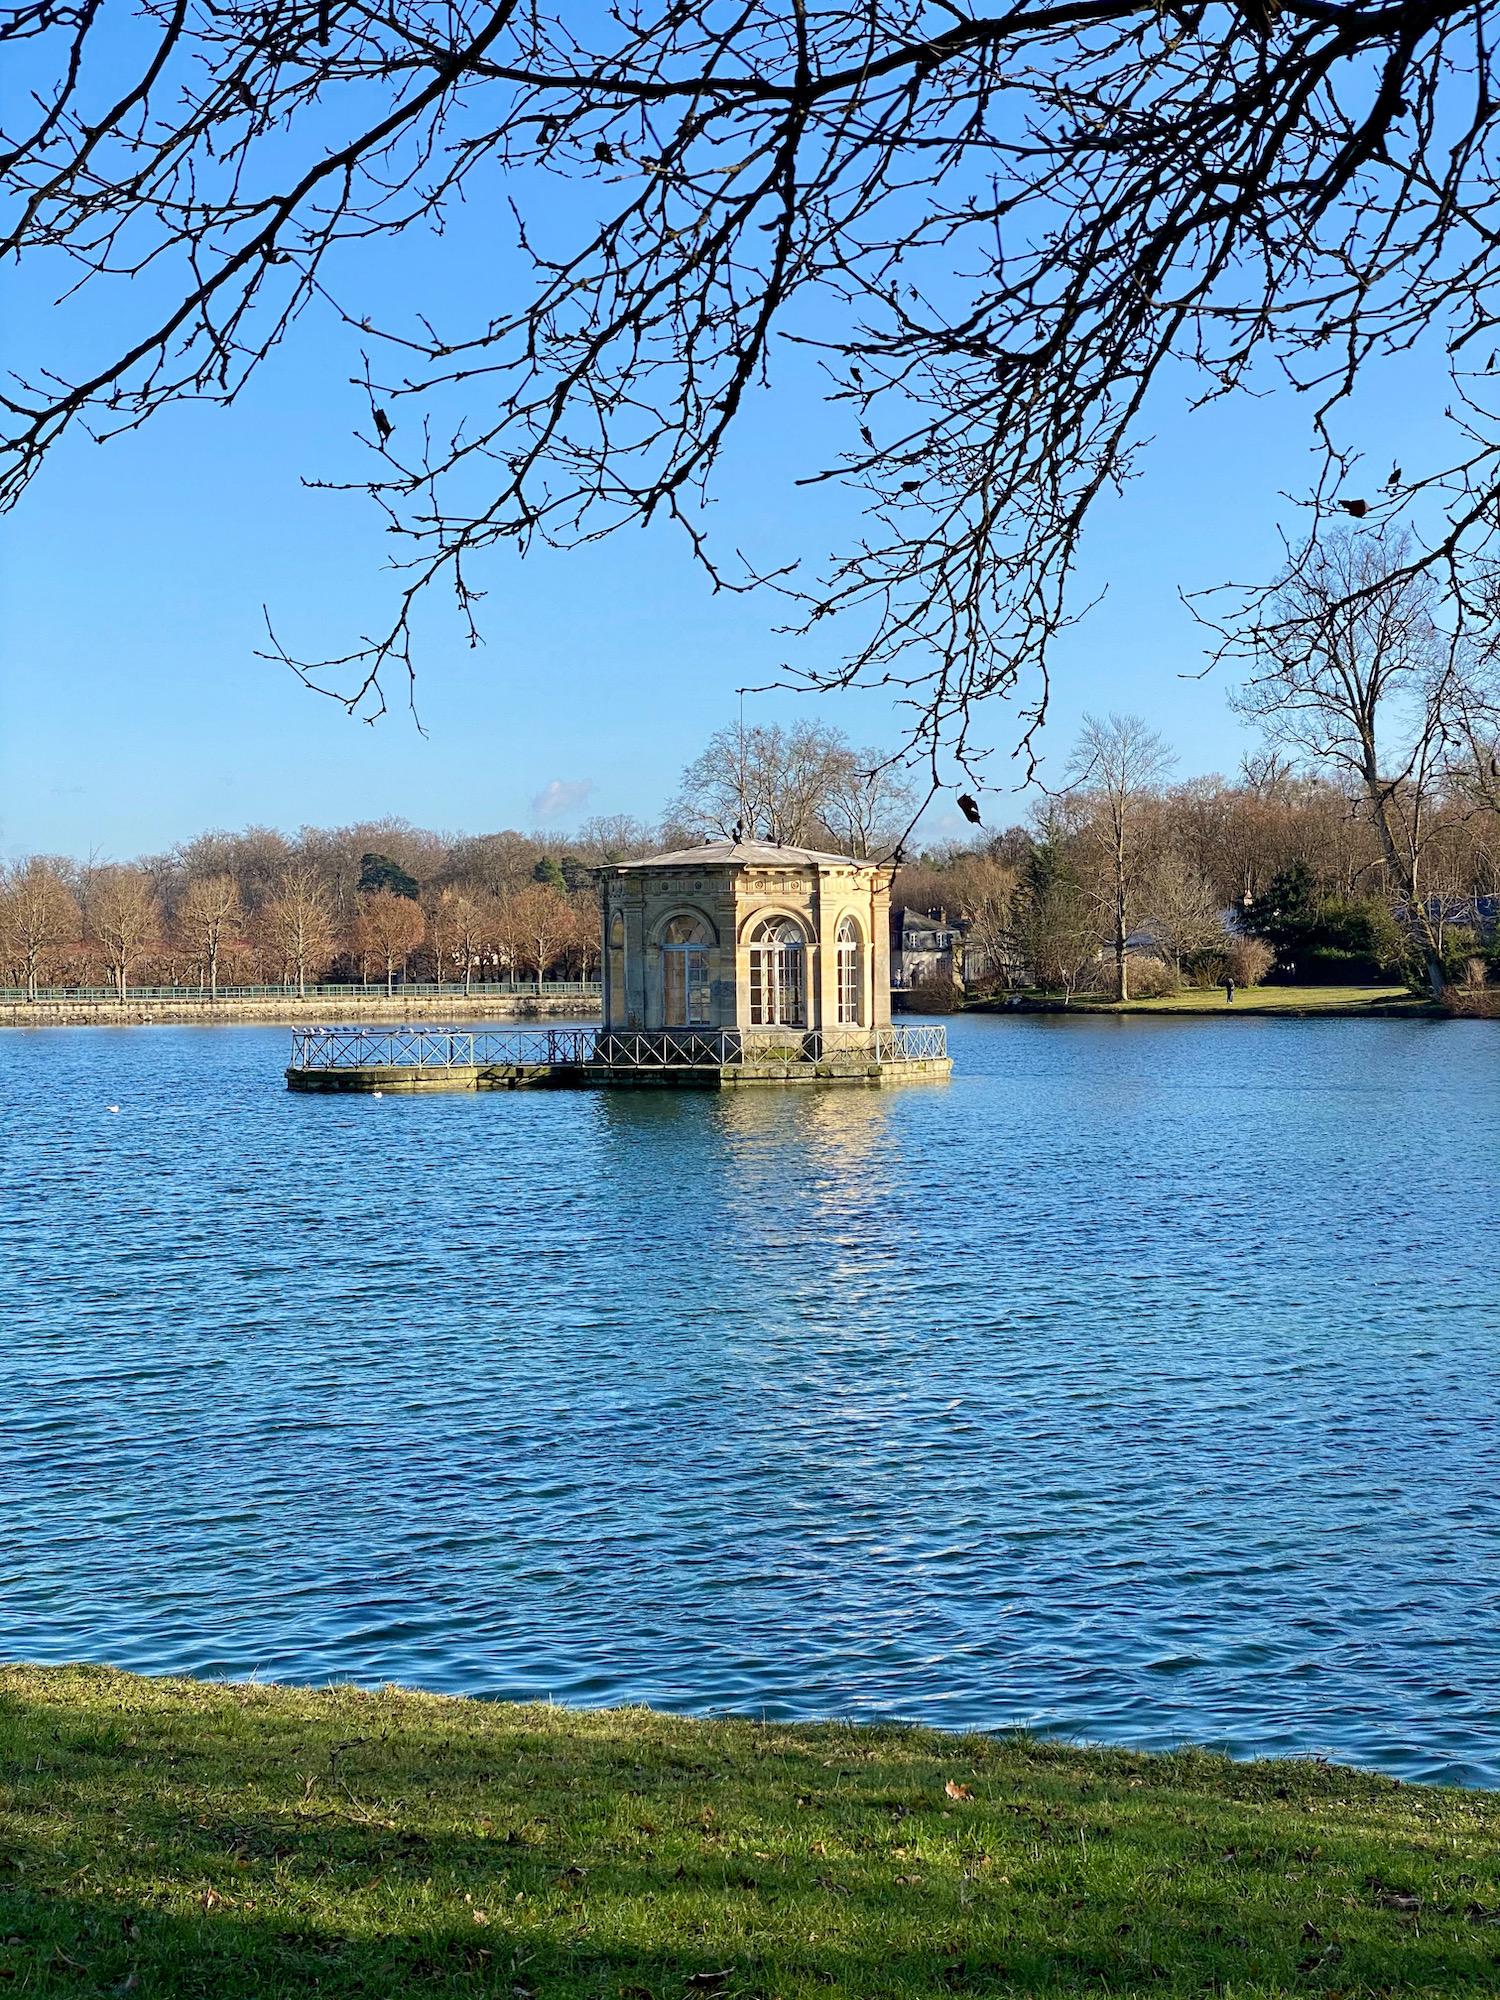 château de fontainebleau pavillion carp lake